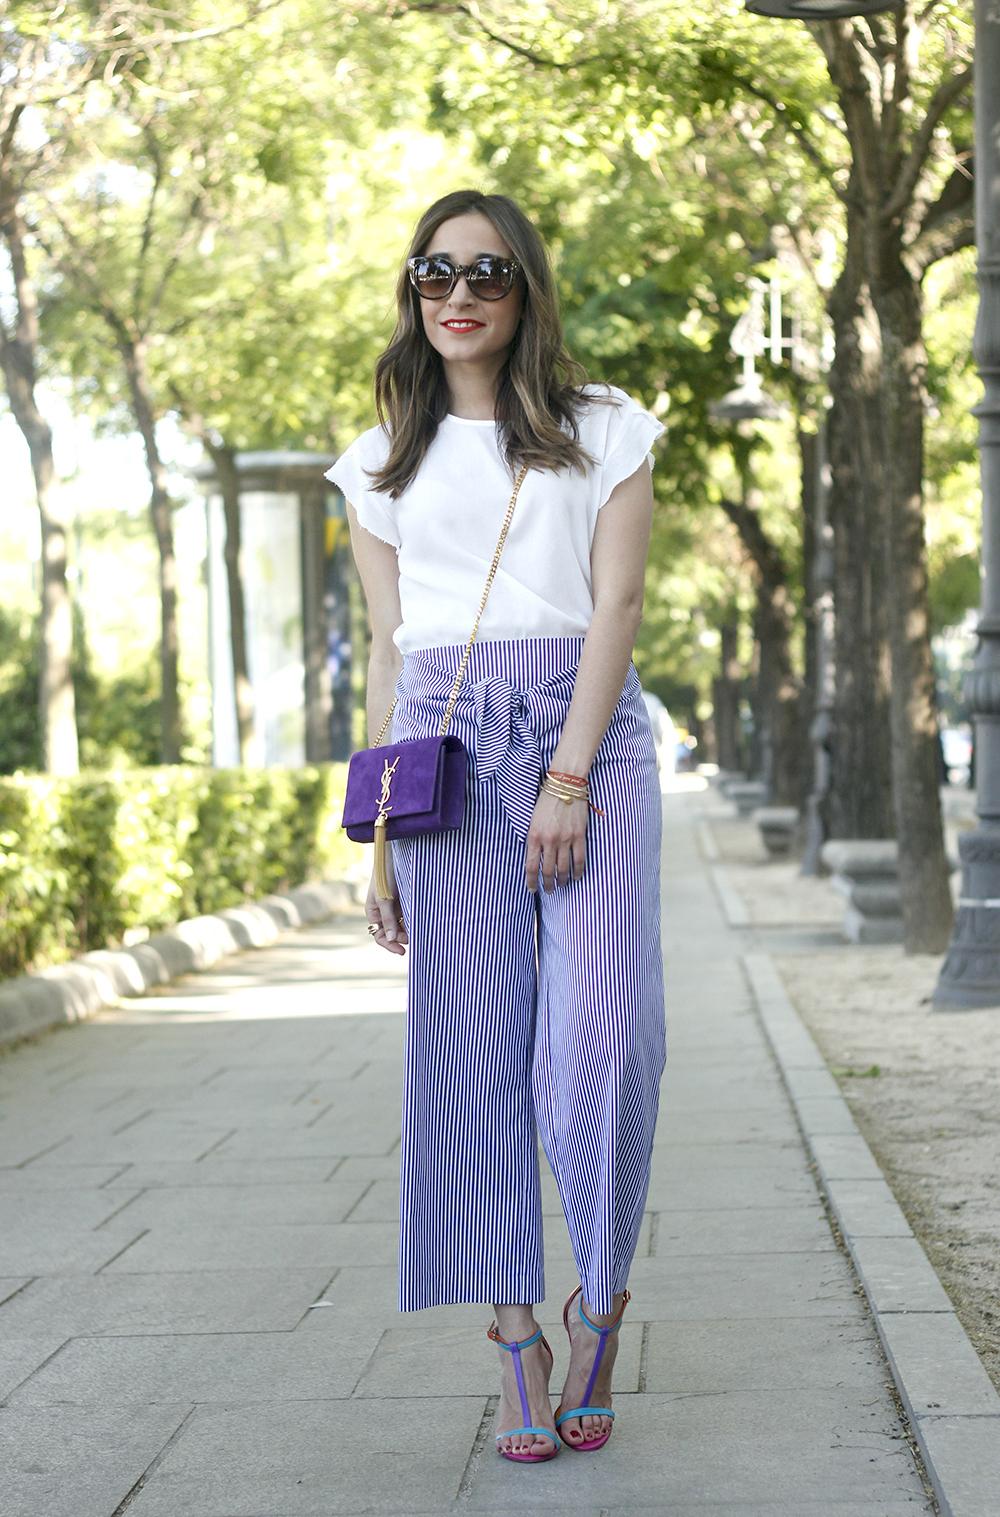 striped pants with bow white shirt carolina herrera sandasl saint laurent bag accessories summer outfit01